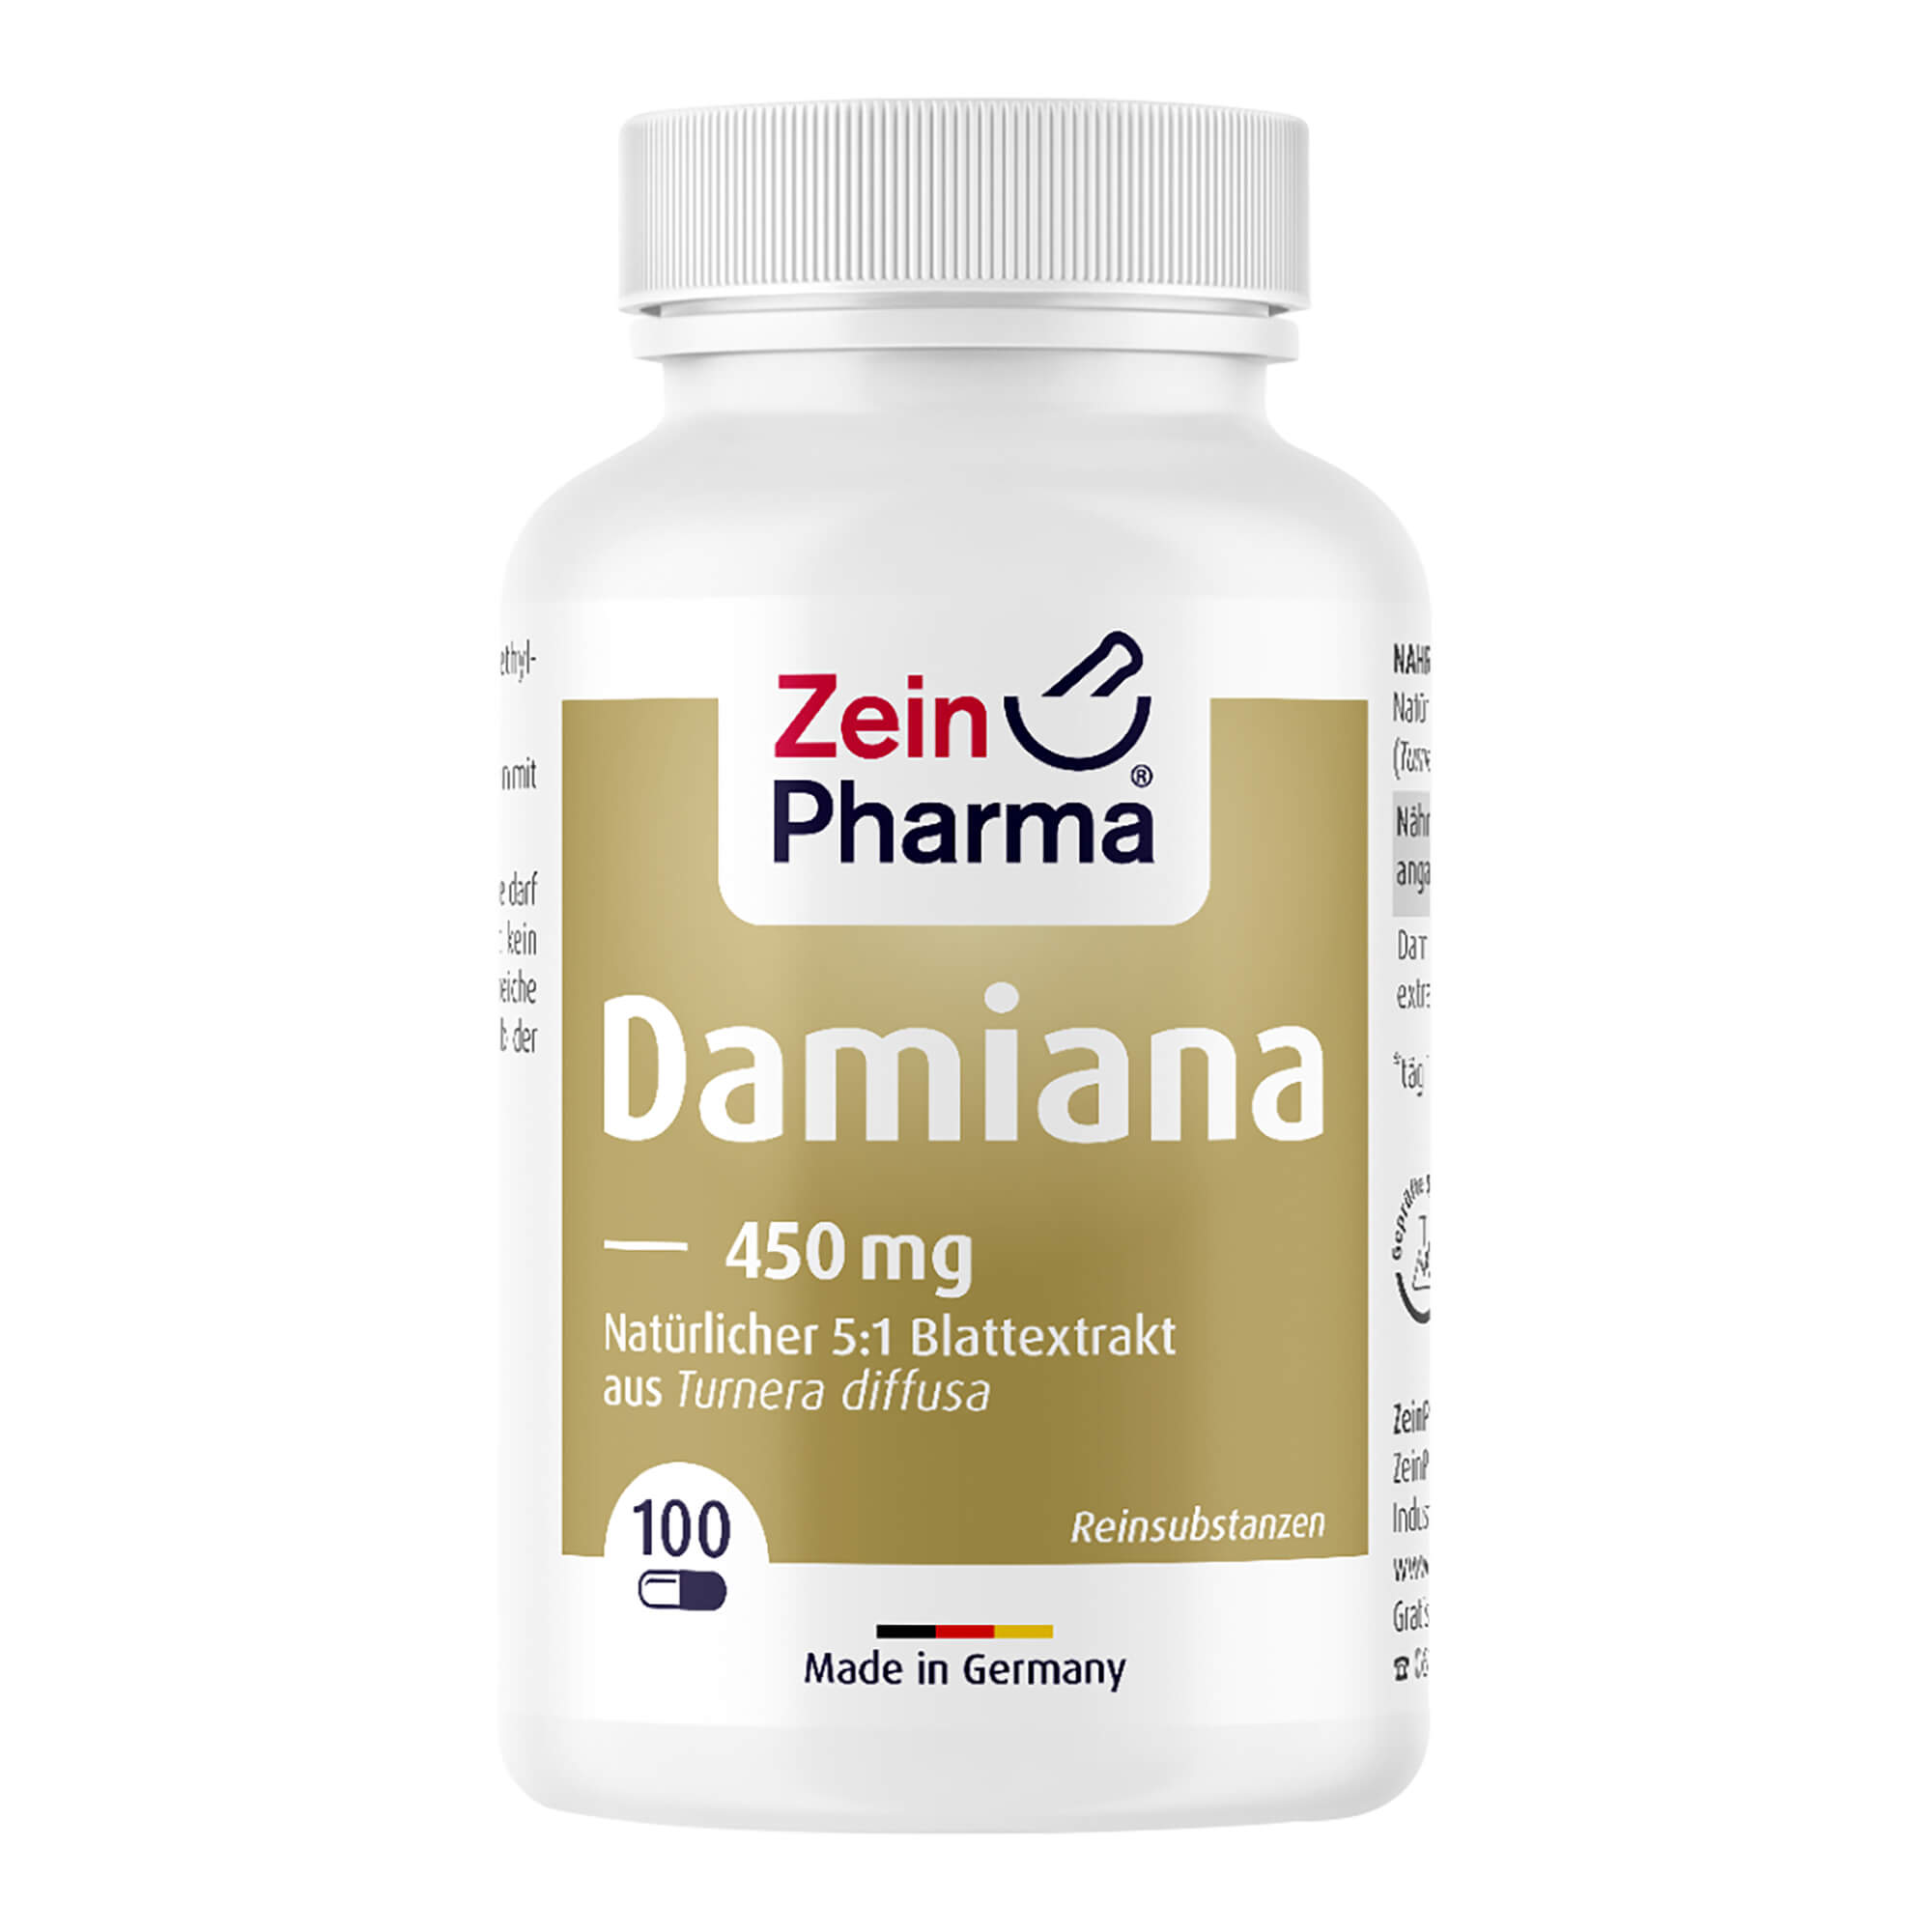 Damiana Kapseln 450 mg 5 zu 1 Blattextrakt